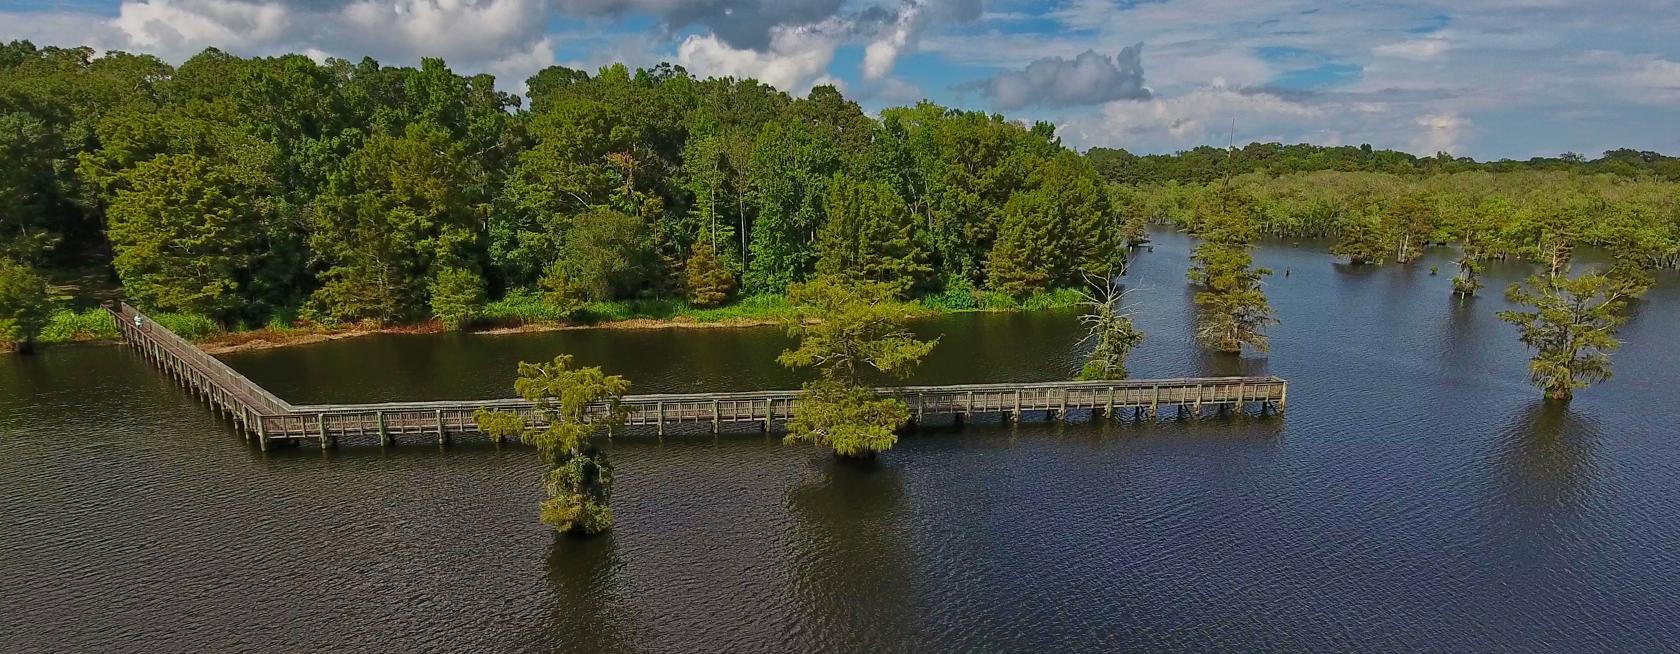 Fontainebleau State Park Talks - Mariagegironde